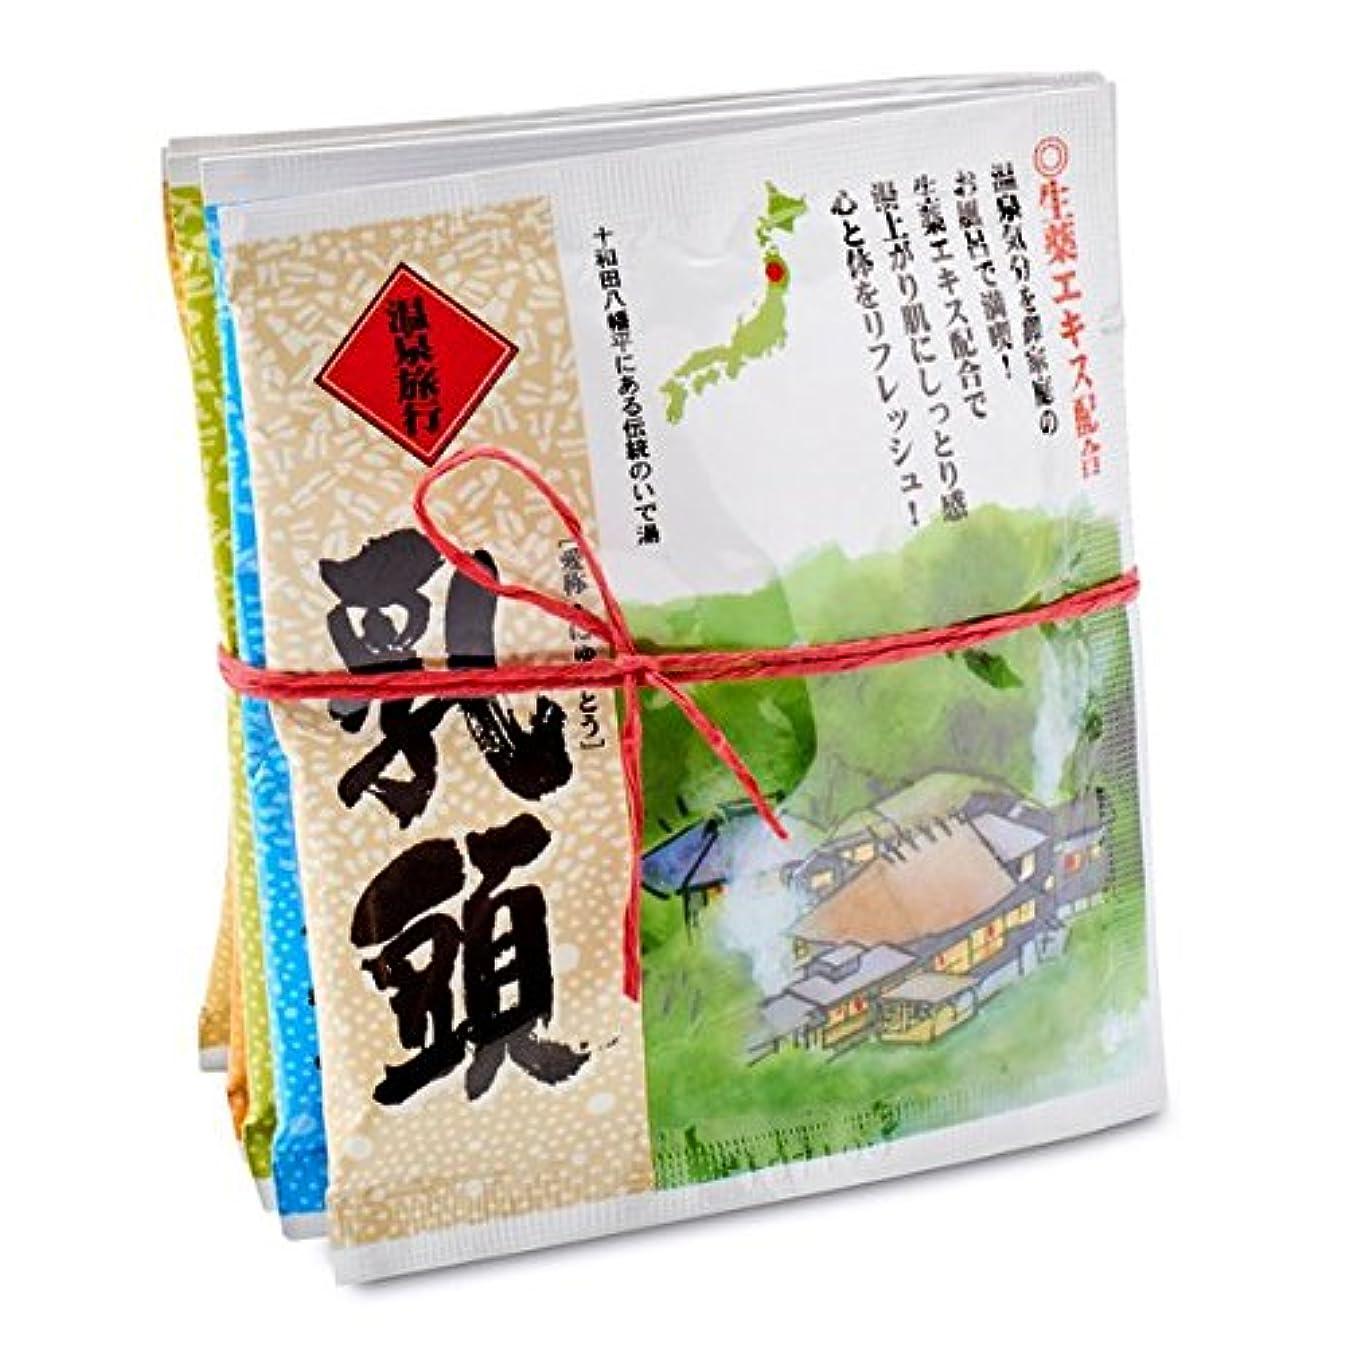 テンポ適性賢い五洲薬品 温泉旅行 乳頭 25g 4987332128304